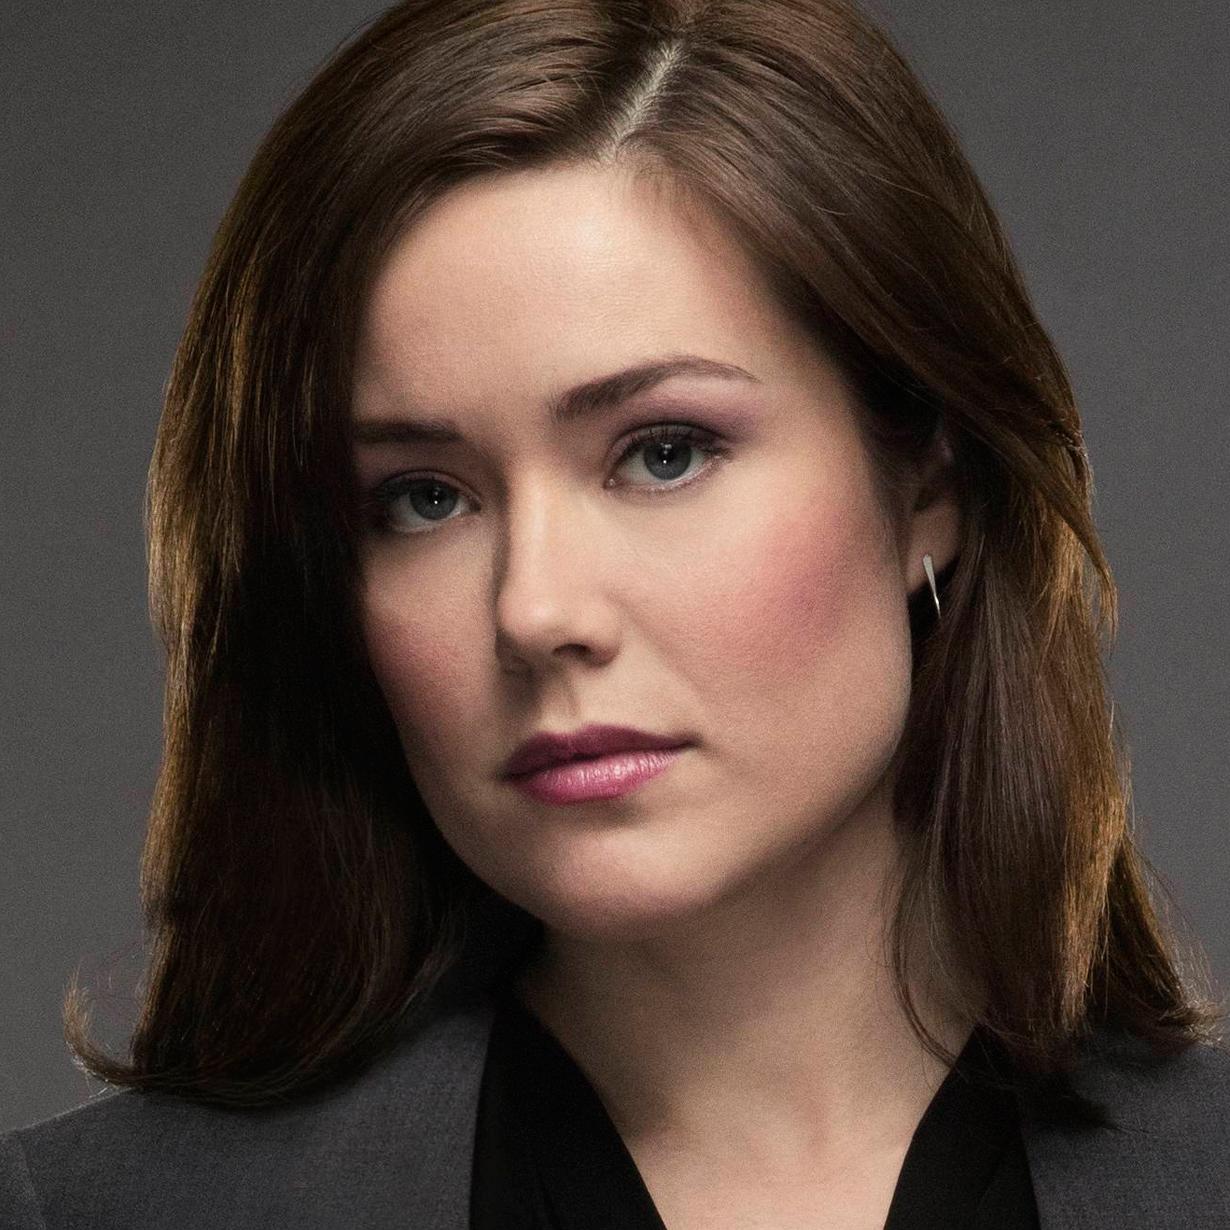 Megan Boone Hair Season 2